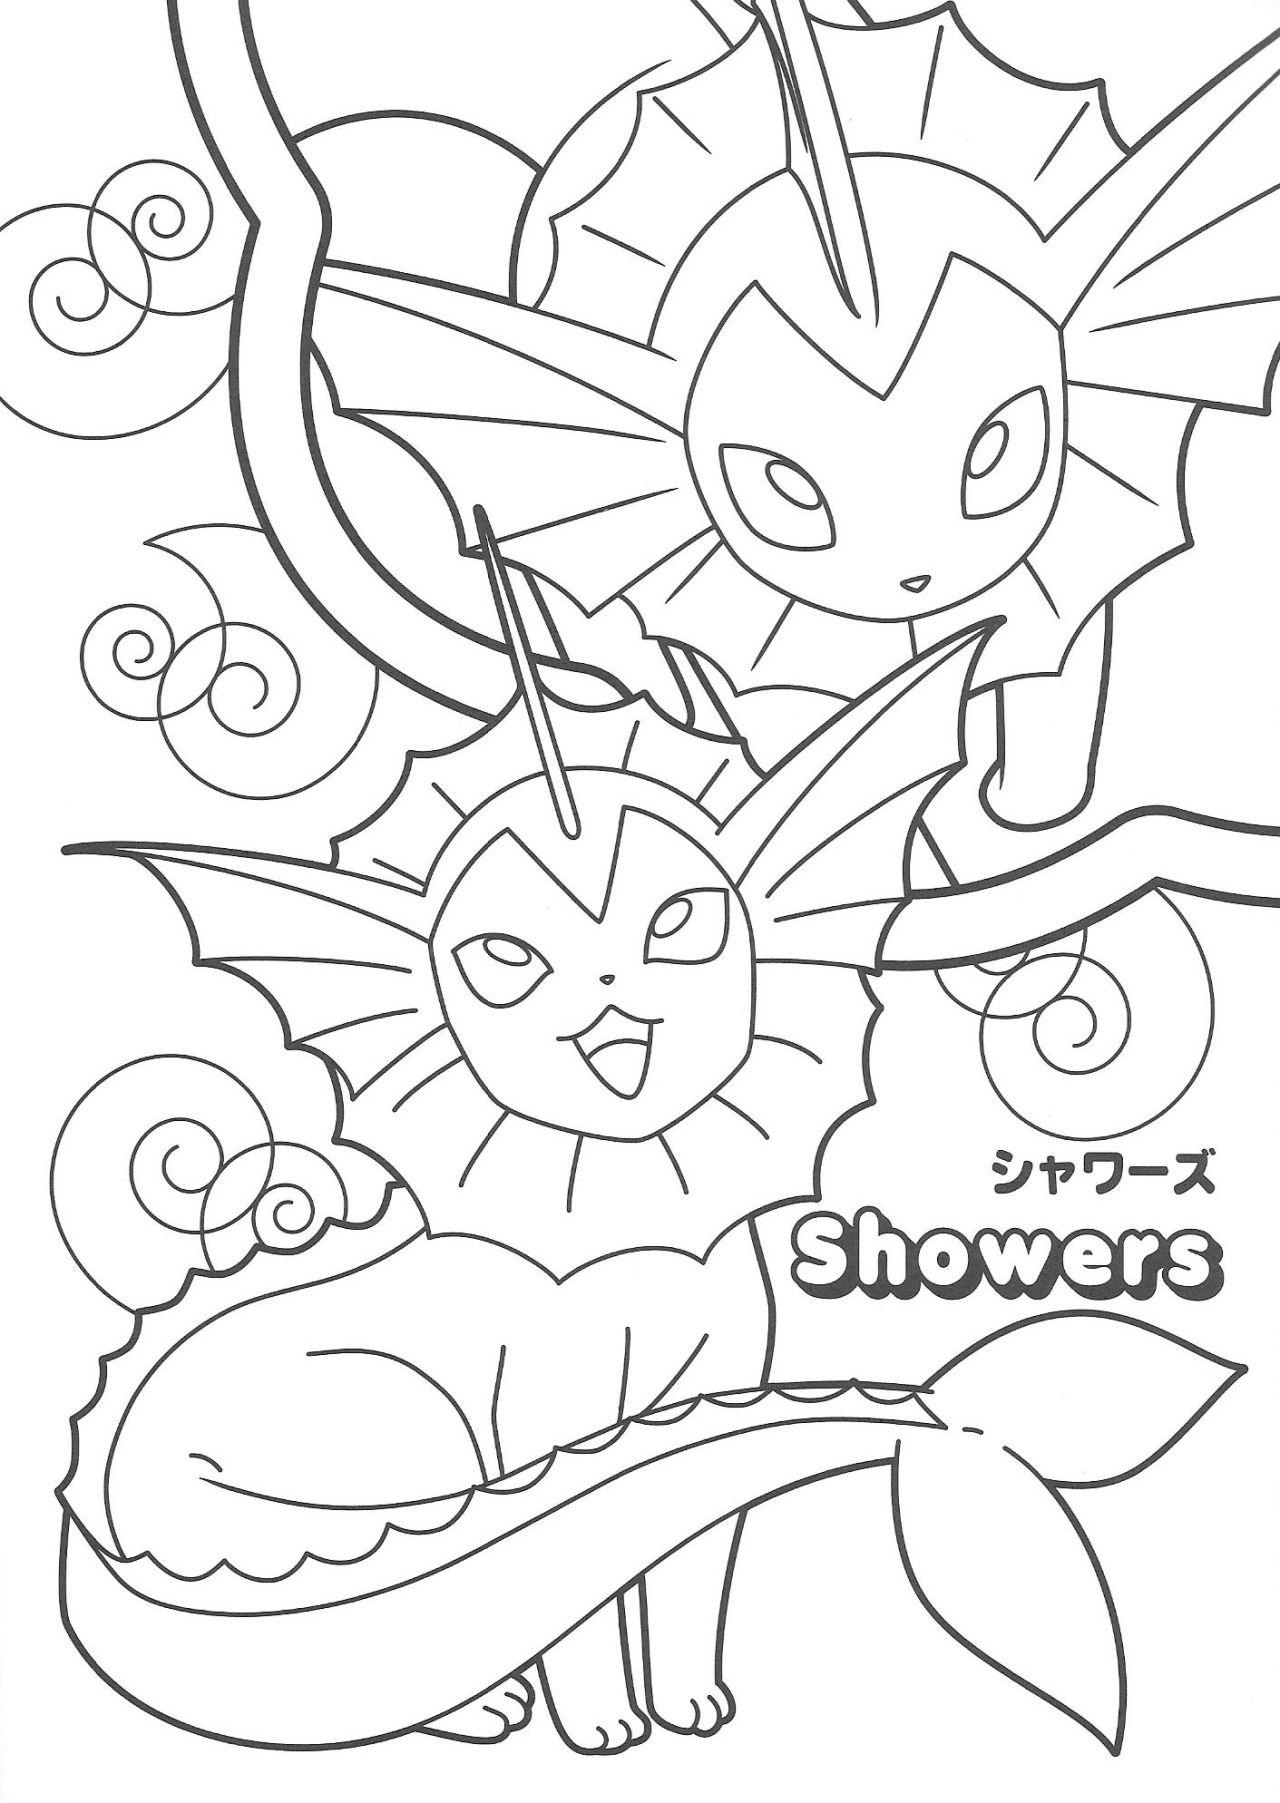 Pok mon scans from pacificpikachu 39 s collection - Apprendre a dessiner pokemon ...